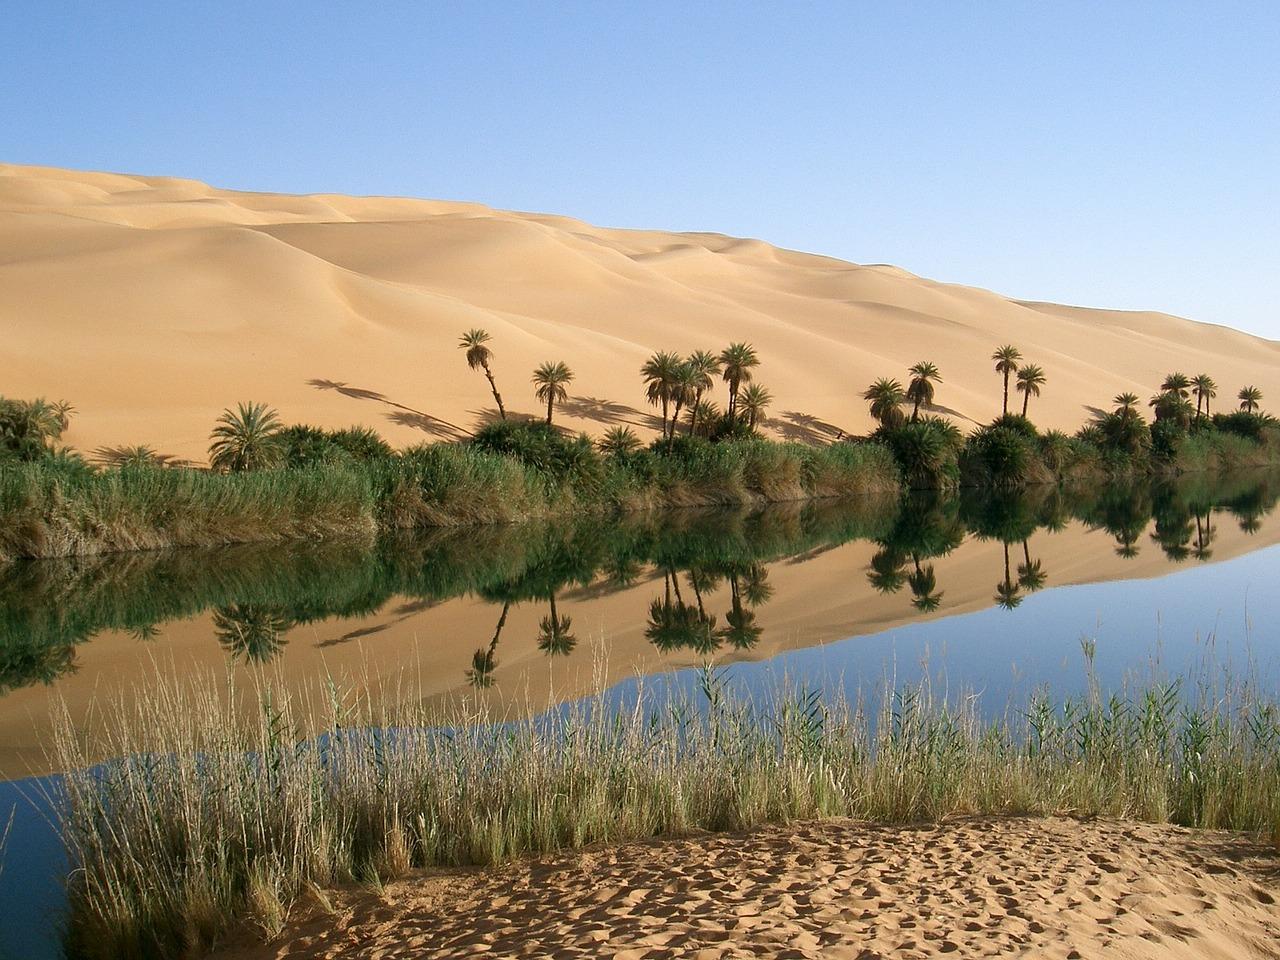 oasis-67549_1280